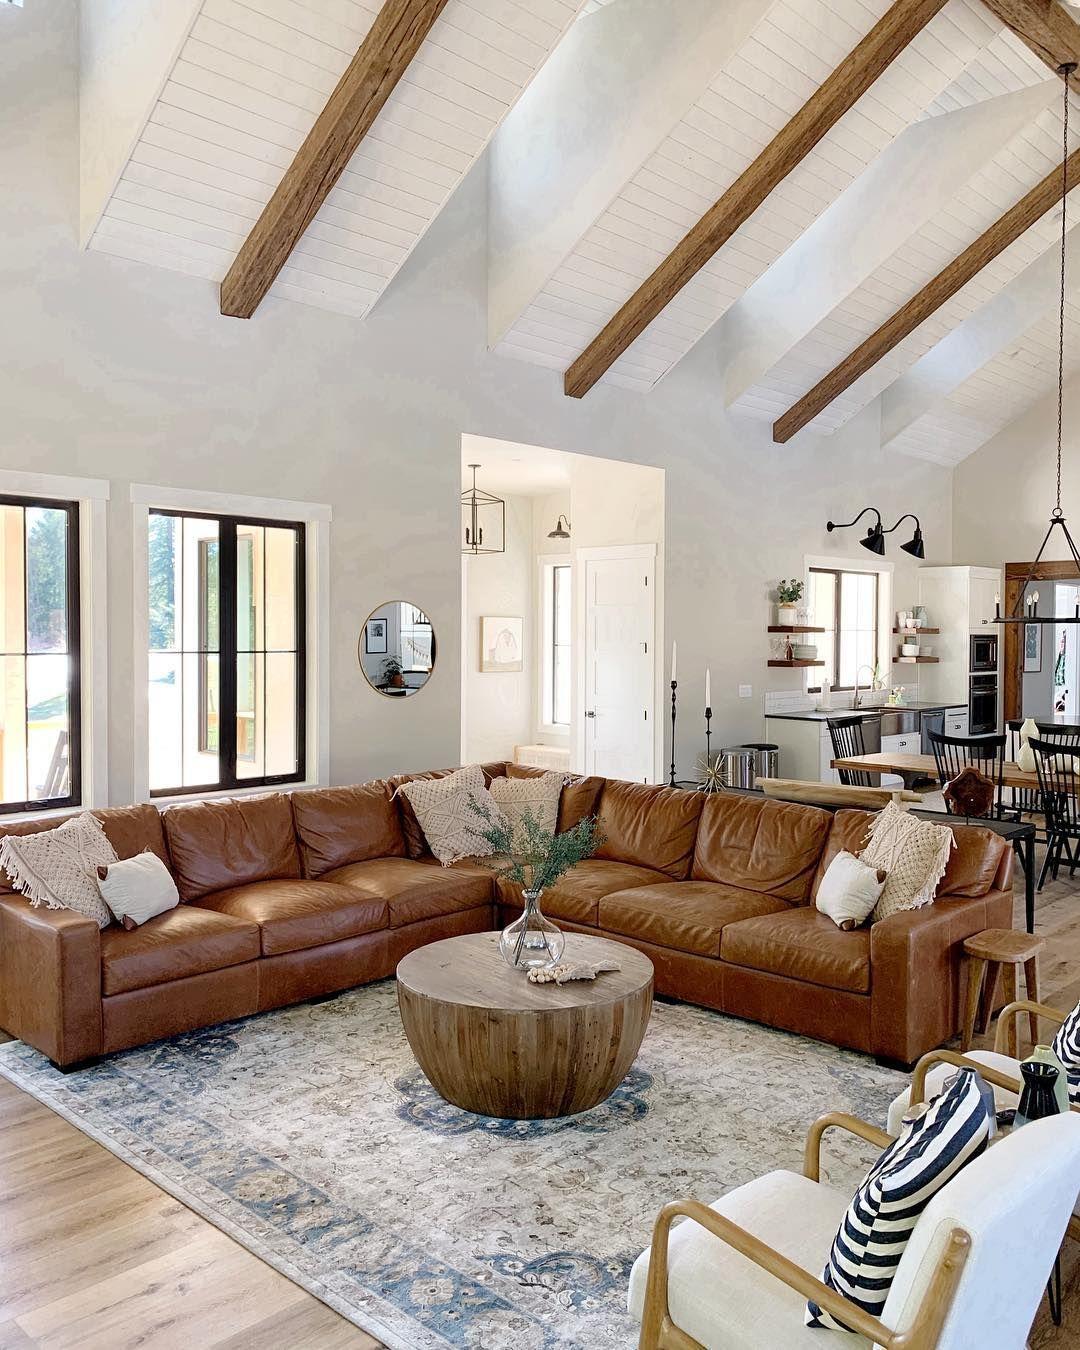 Get Home Design Ideas: Modern Farmhouse Inspo On Instagram: I Get So Many